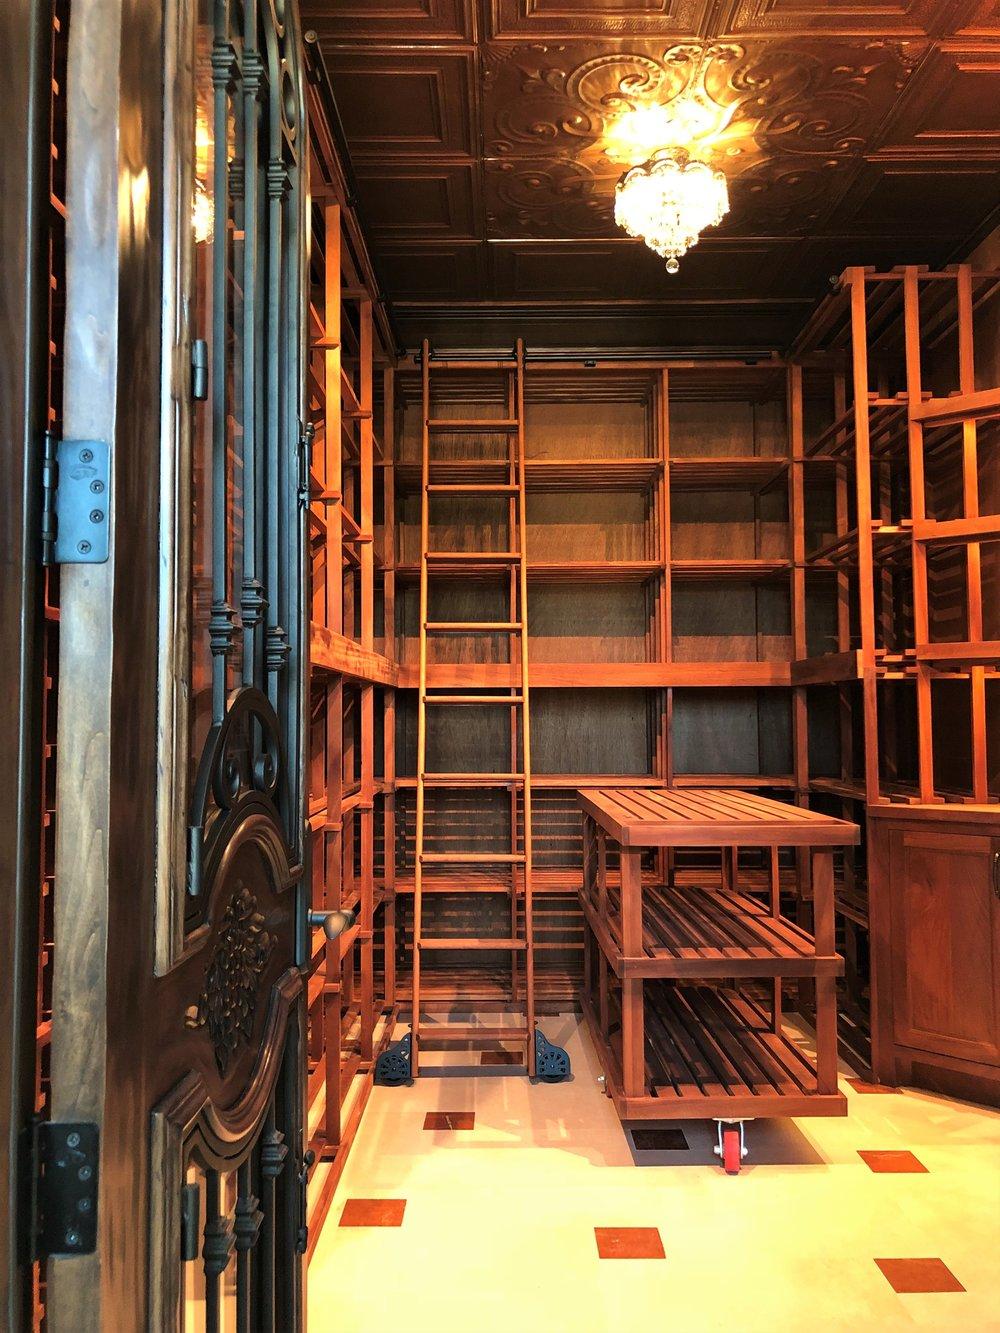 High end wine cellar